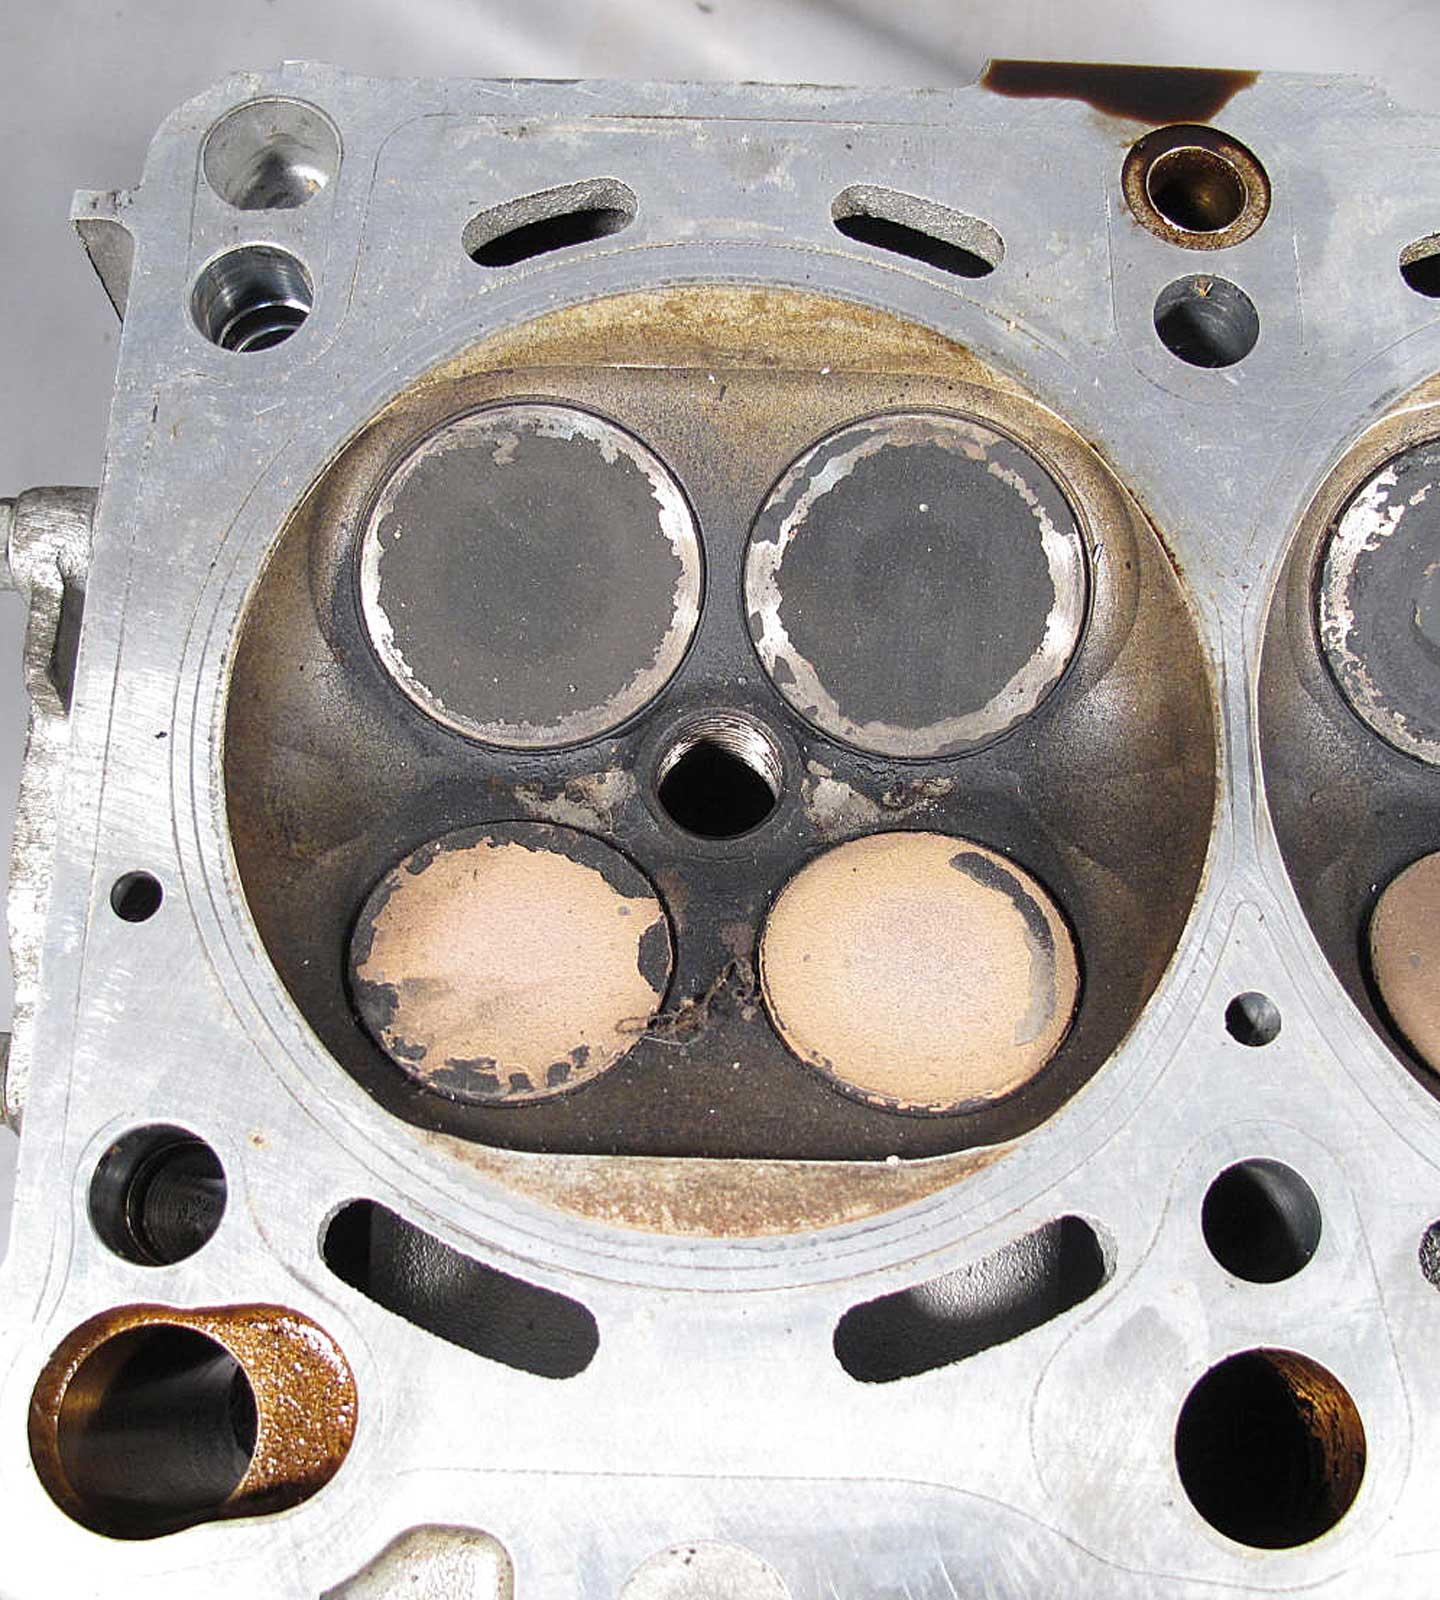 BMW S62 5.0L ///M M5 Z8 Engine Left Bank 2 Cylinder Head